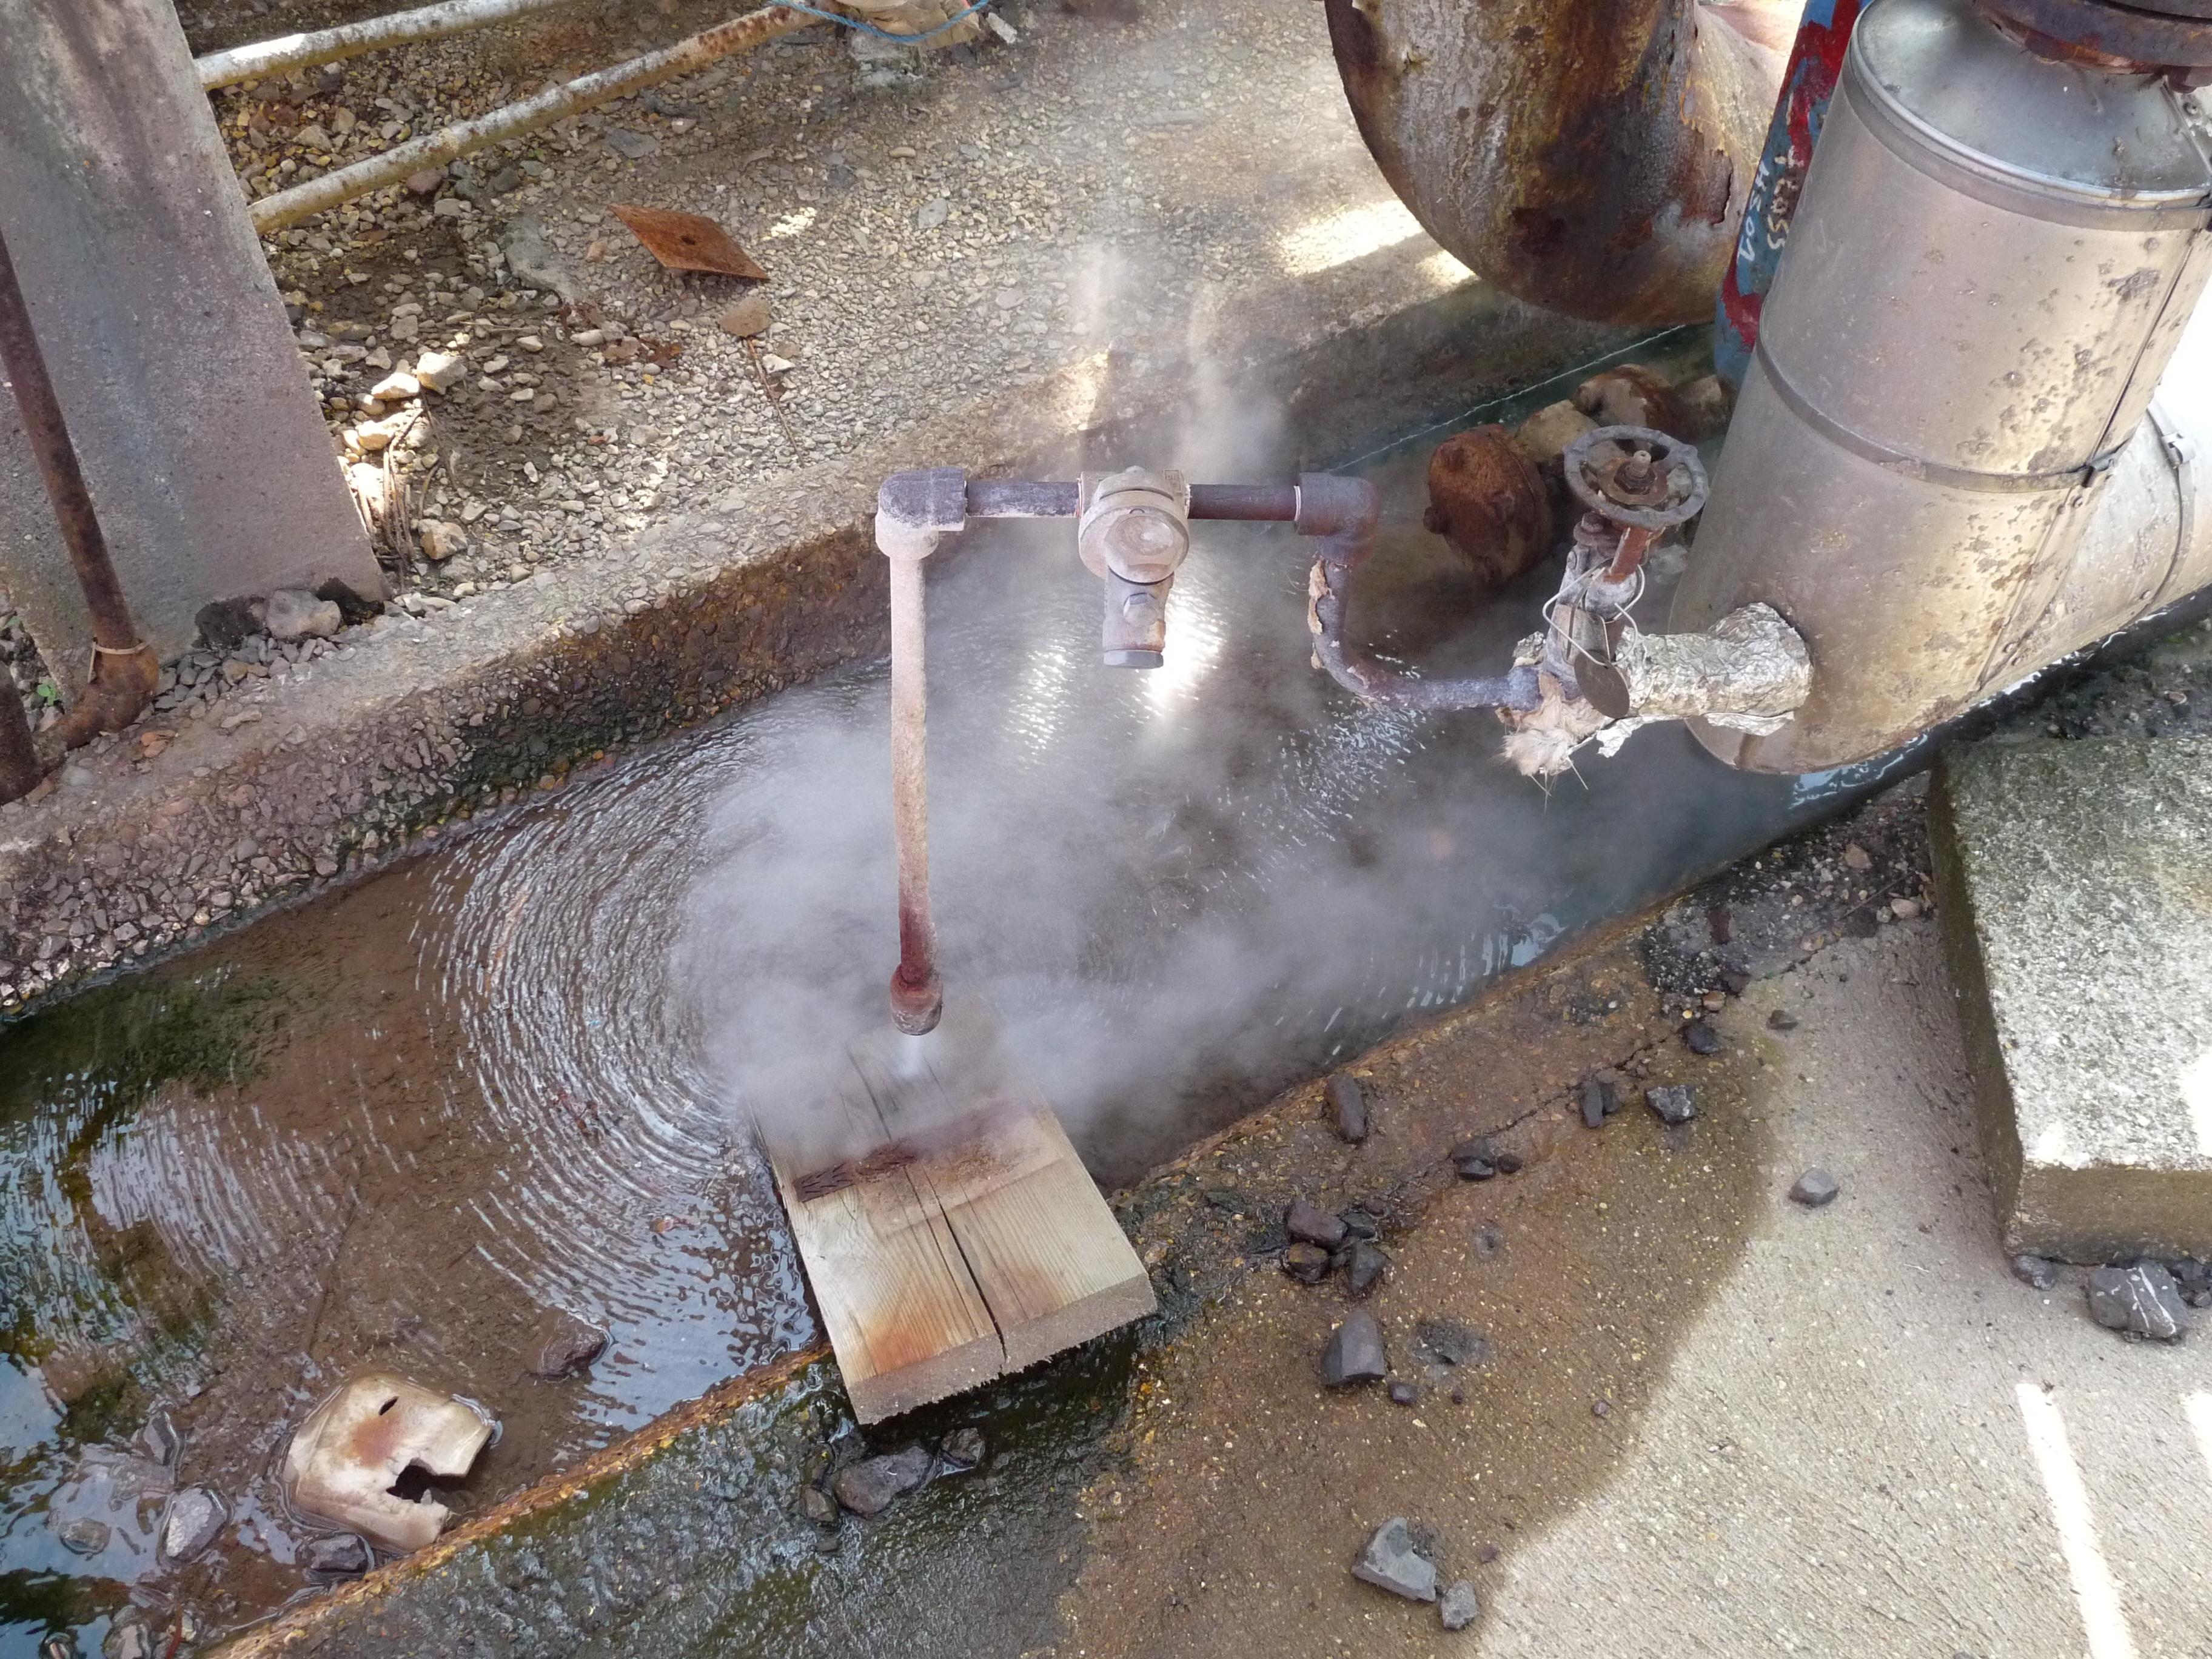 Rise before steam trap